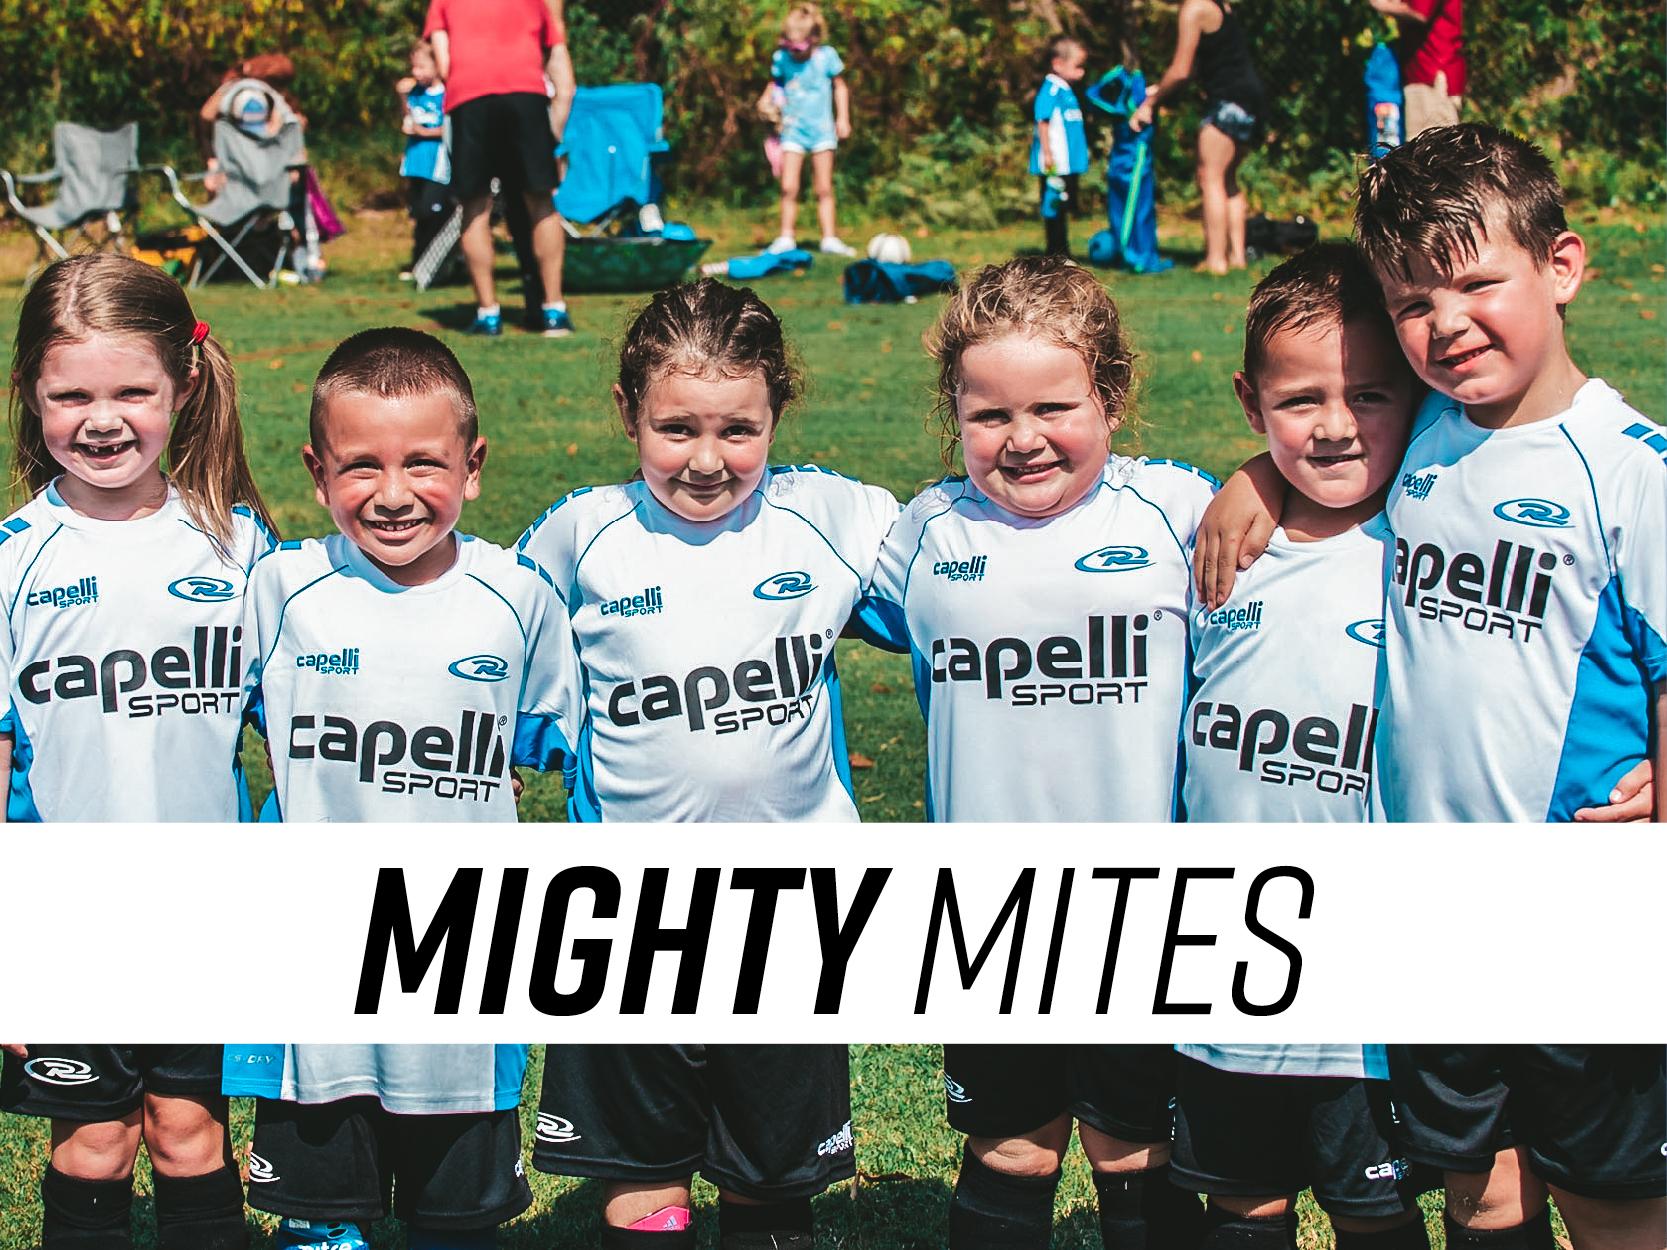 Mighty Mites4